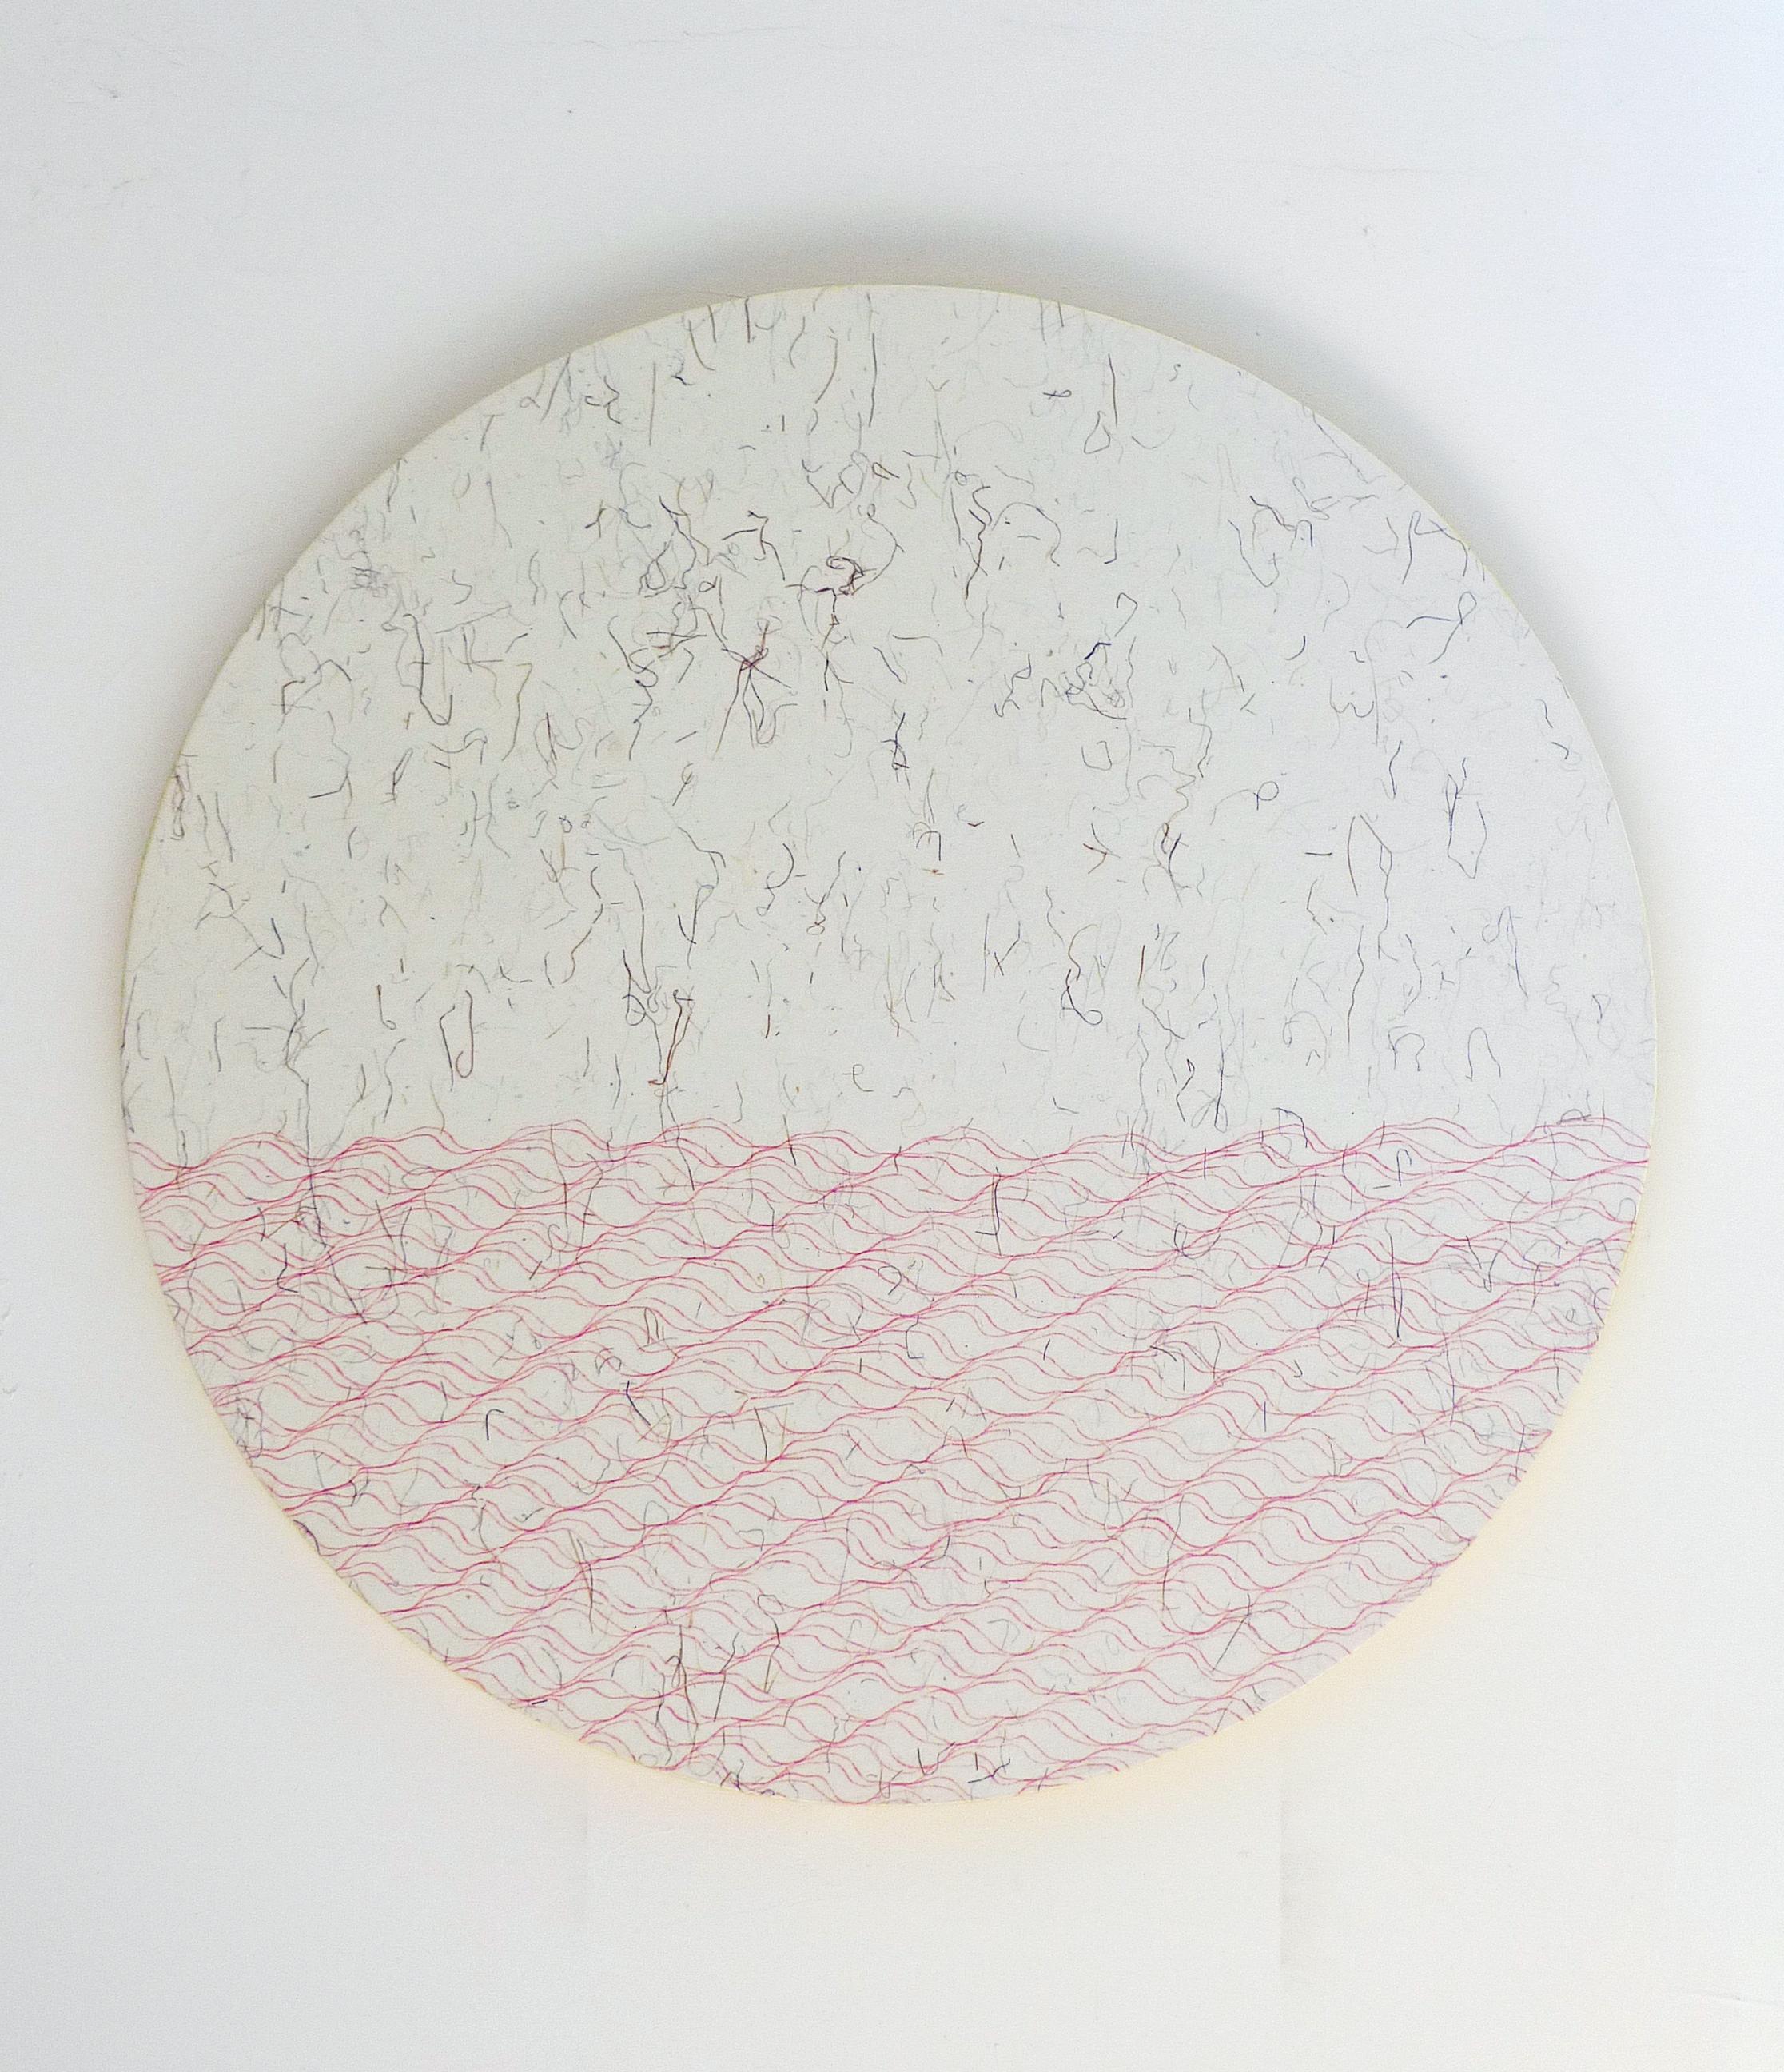 Zhou Jianjun 周建军, Untitled 无题, 2012, Ink on paper 纸本水墨设色, Dia 66.5 cm